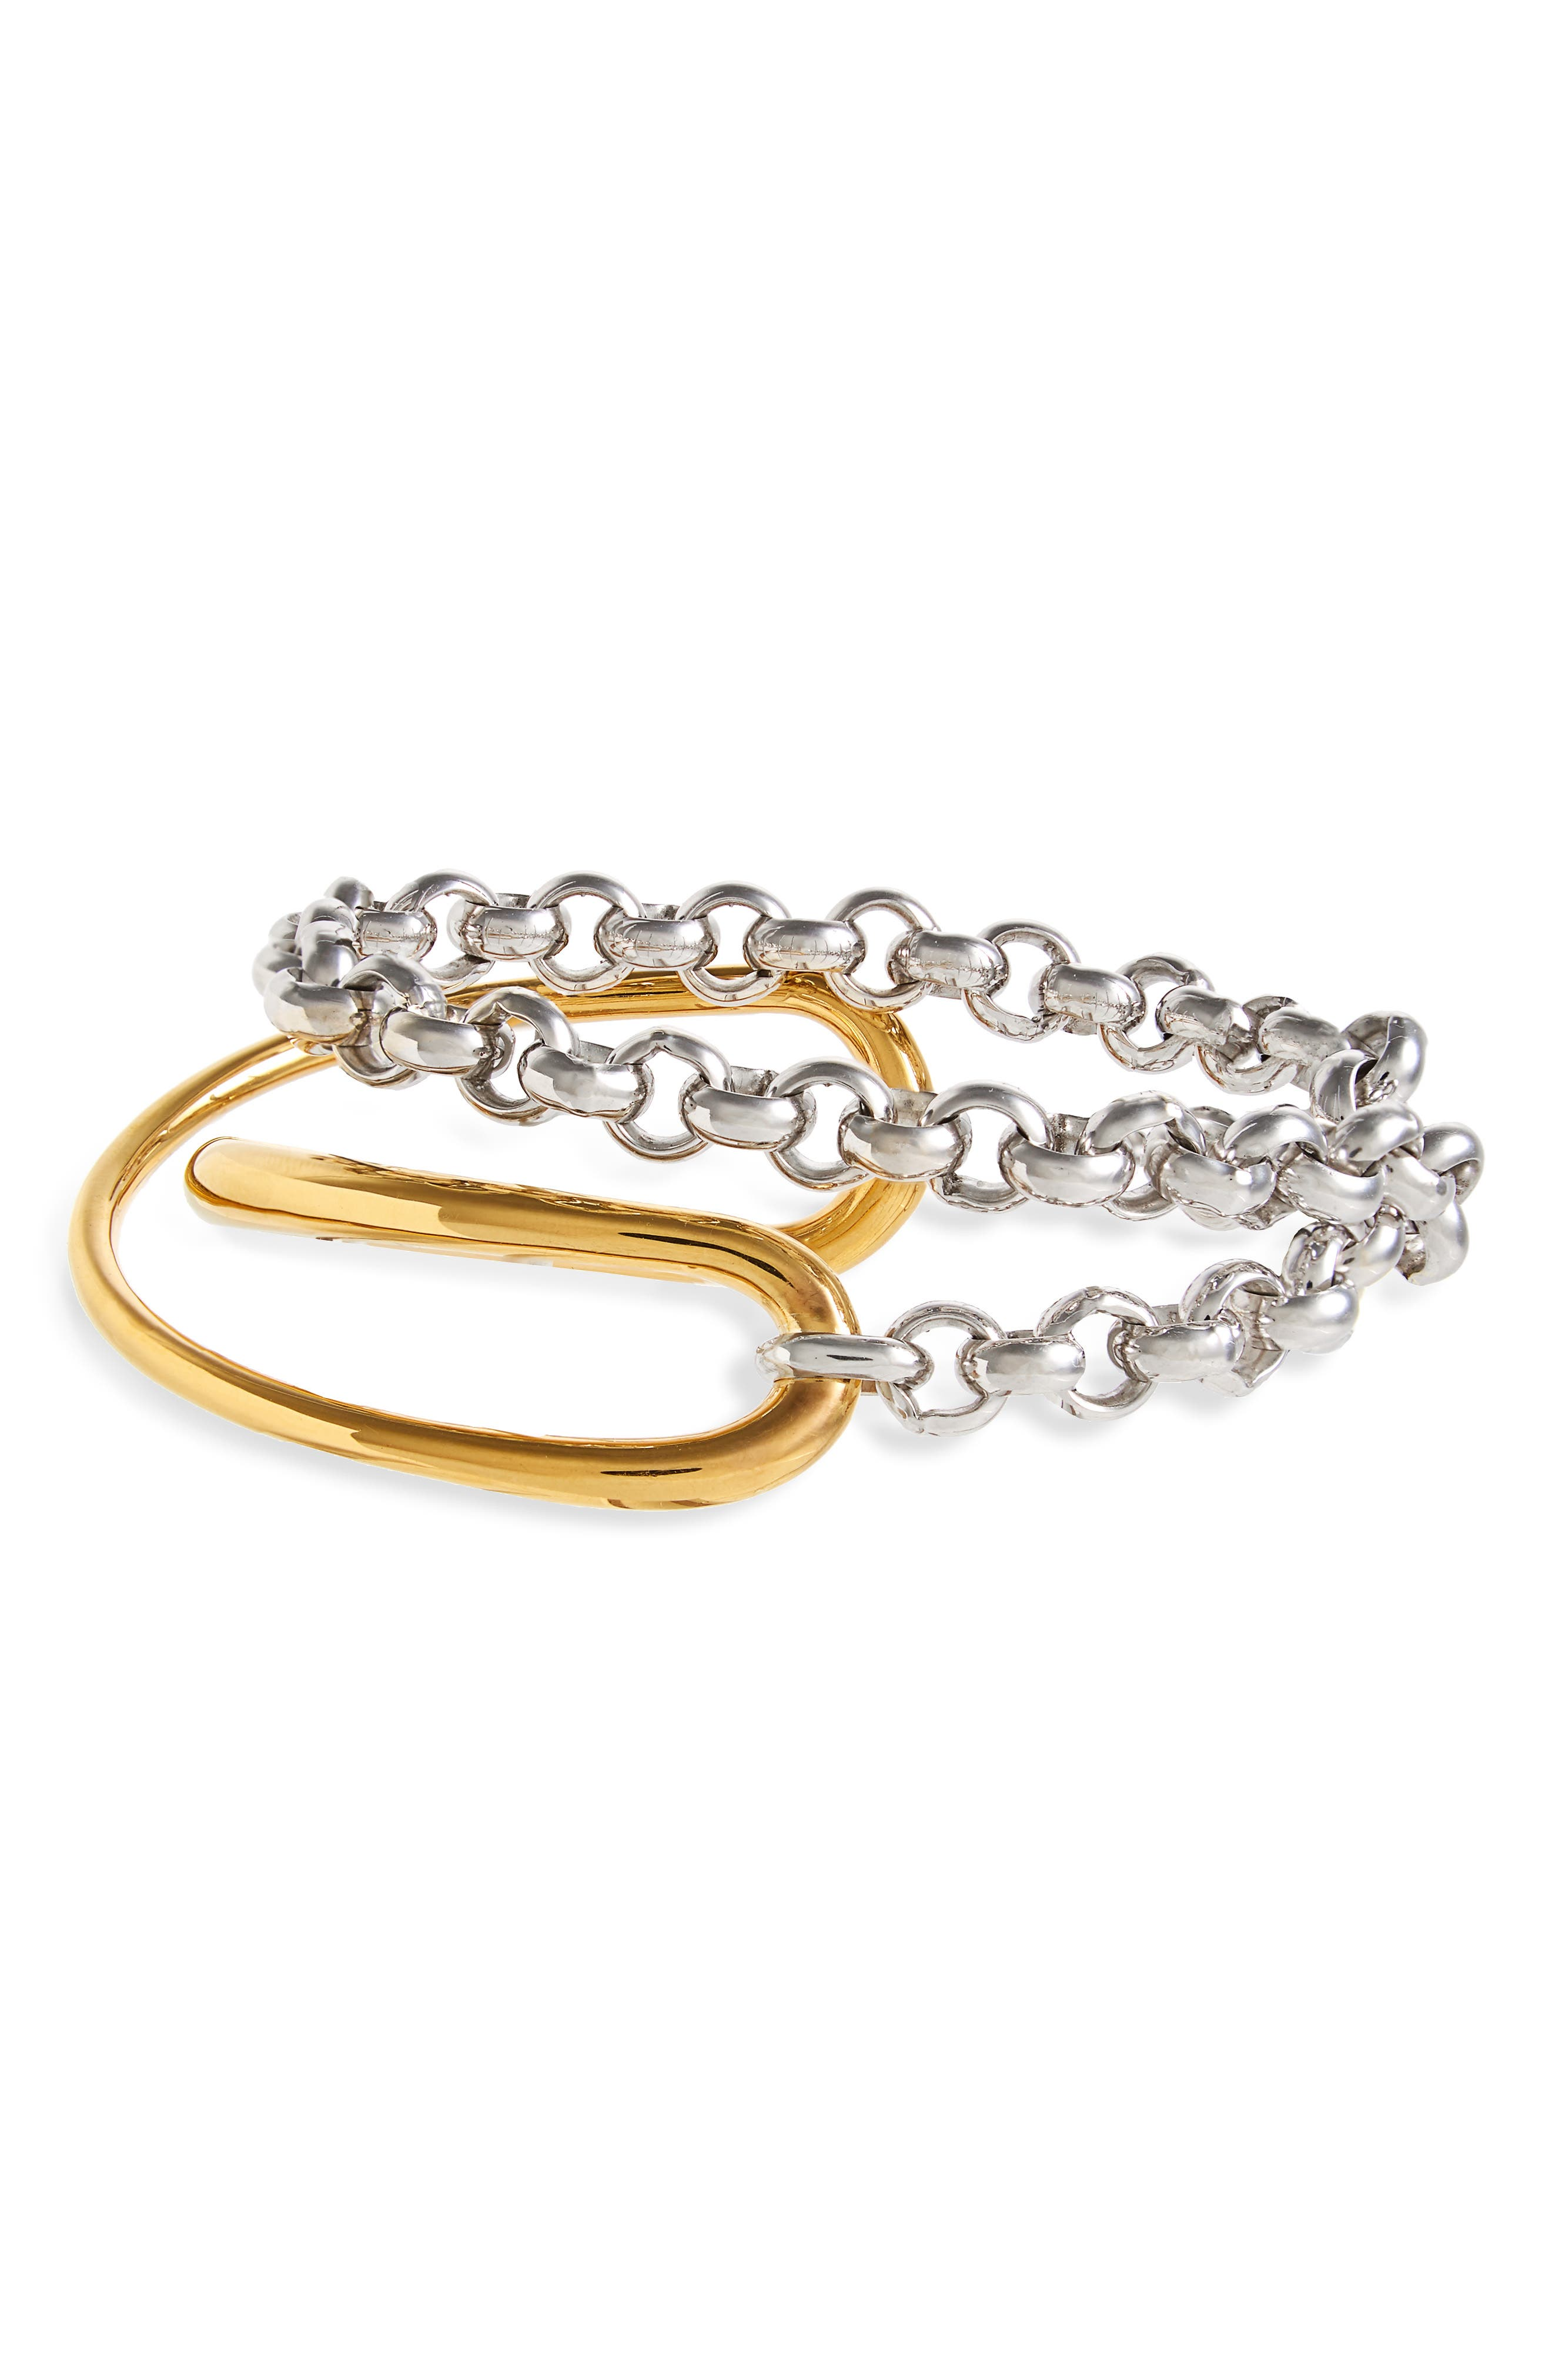 Charlotte Chenais Initial Chain Bracelet